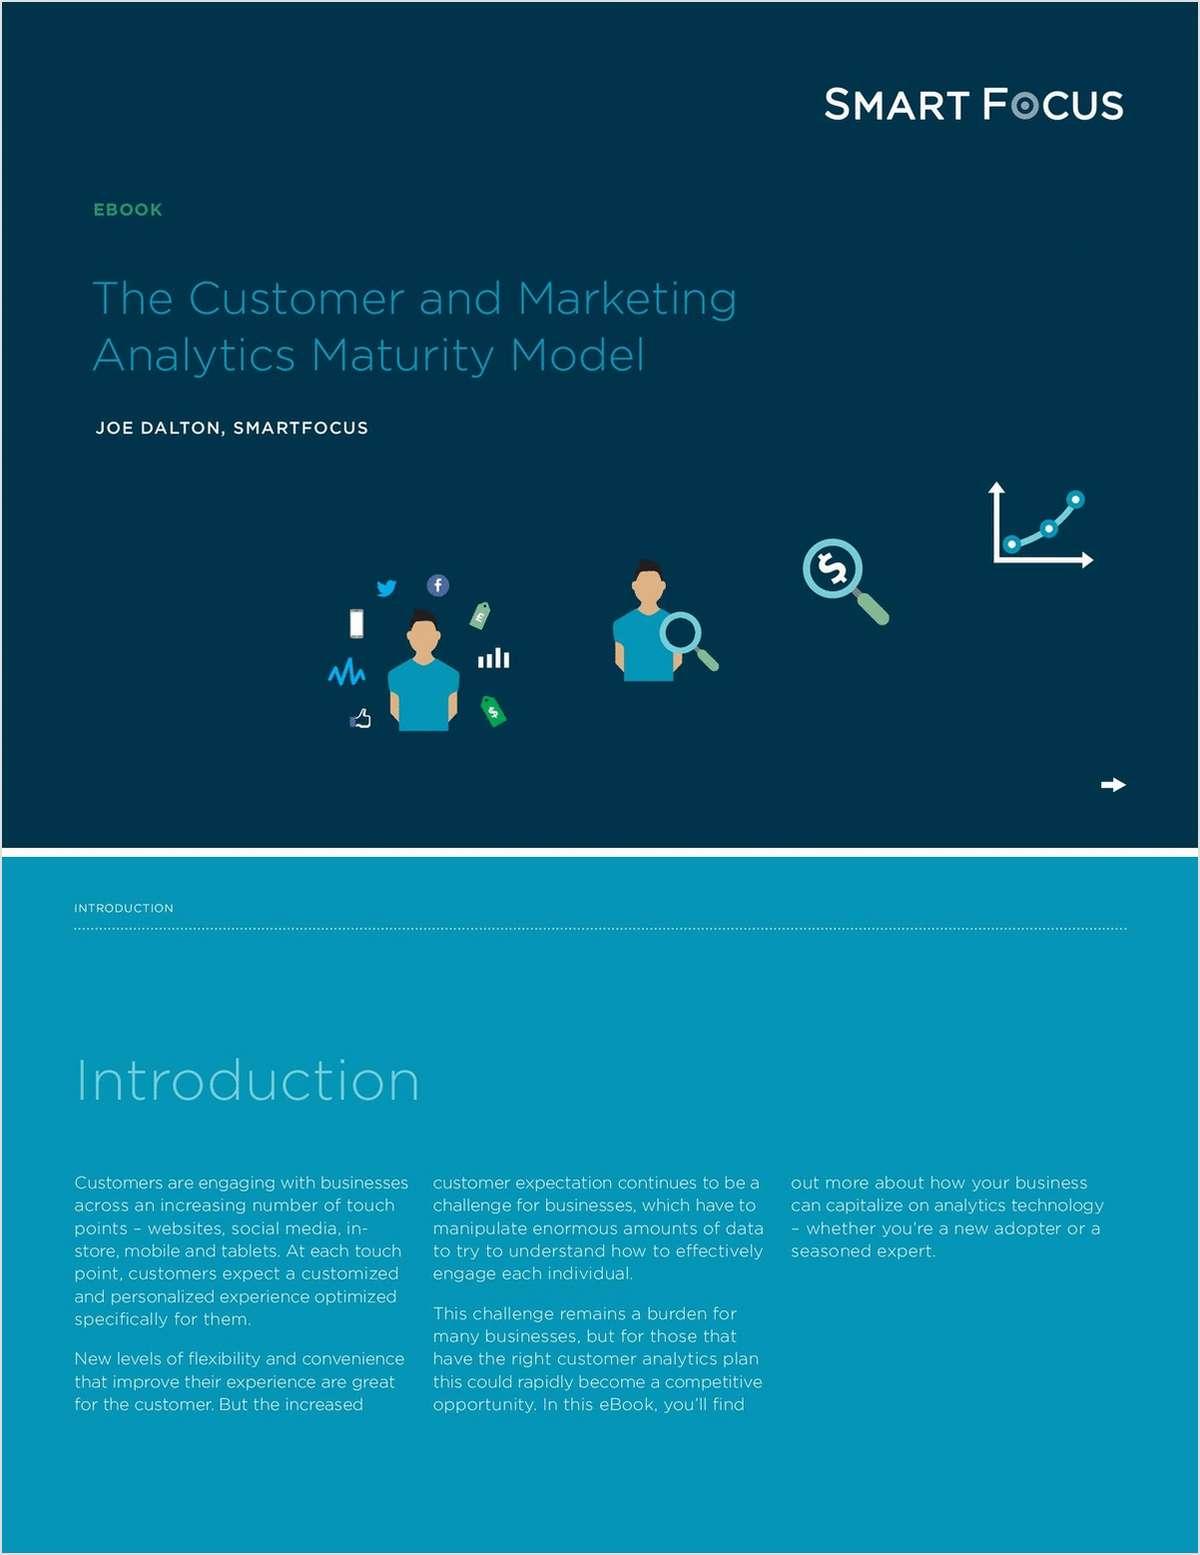 The Customer and Marketing Analytics Maturity Model